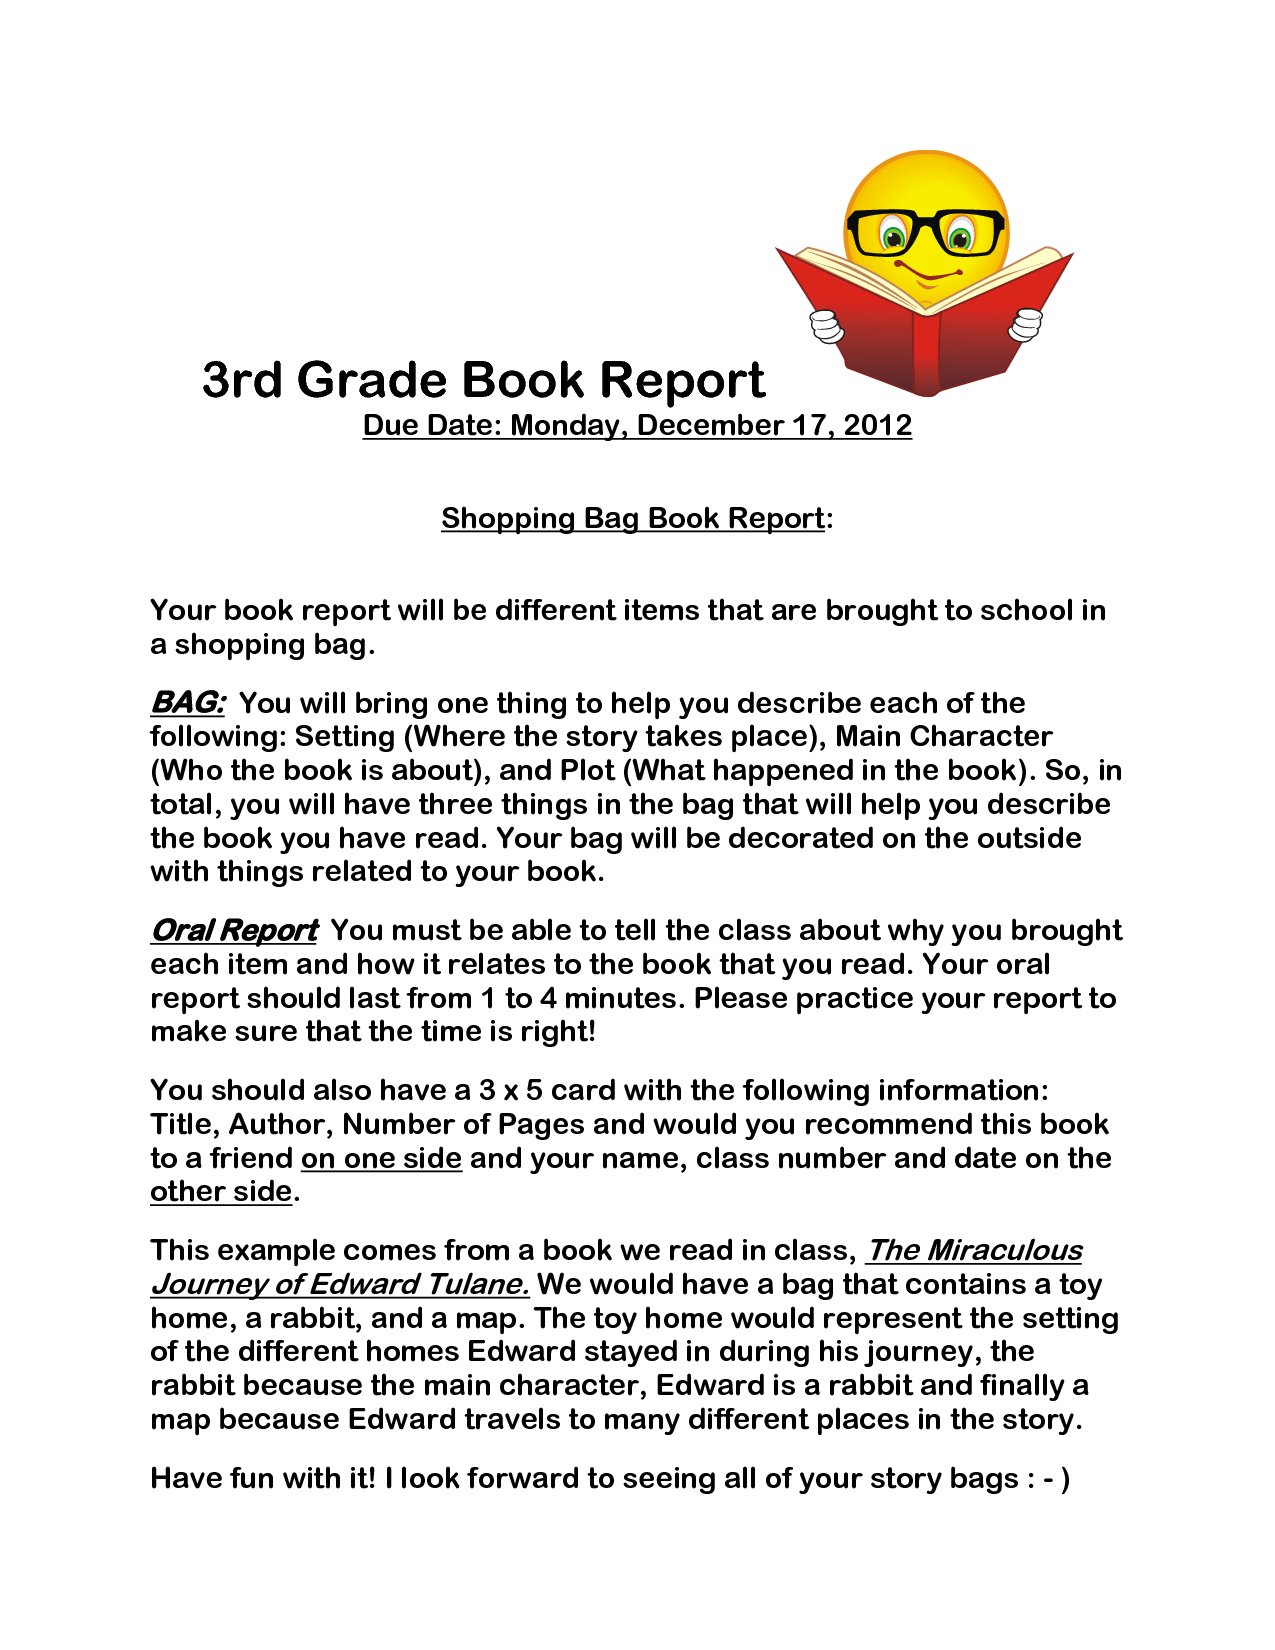 Free Book Report Template 3rd Grade   Google Search